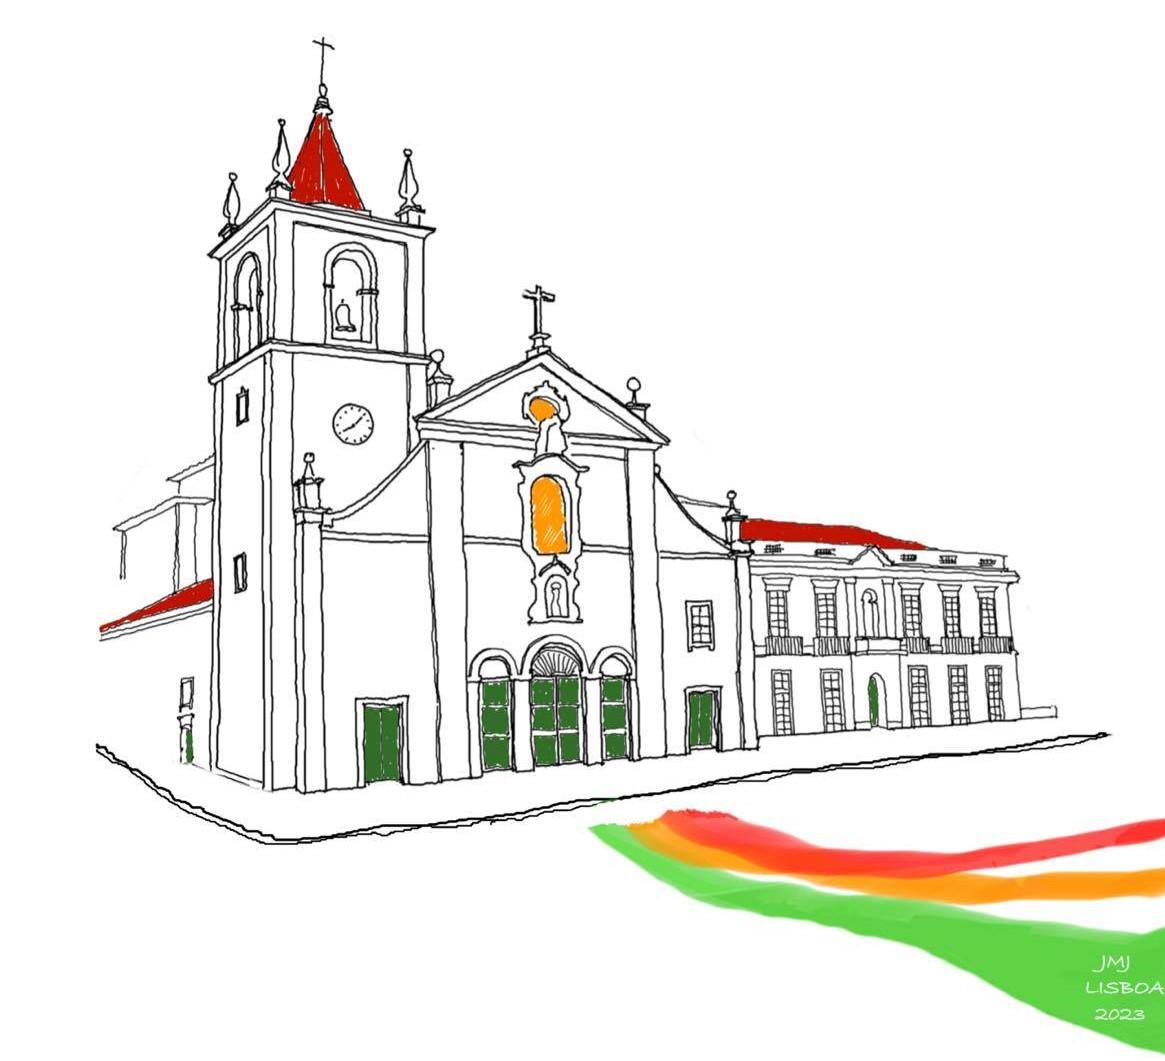 Carmo de Viana